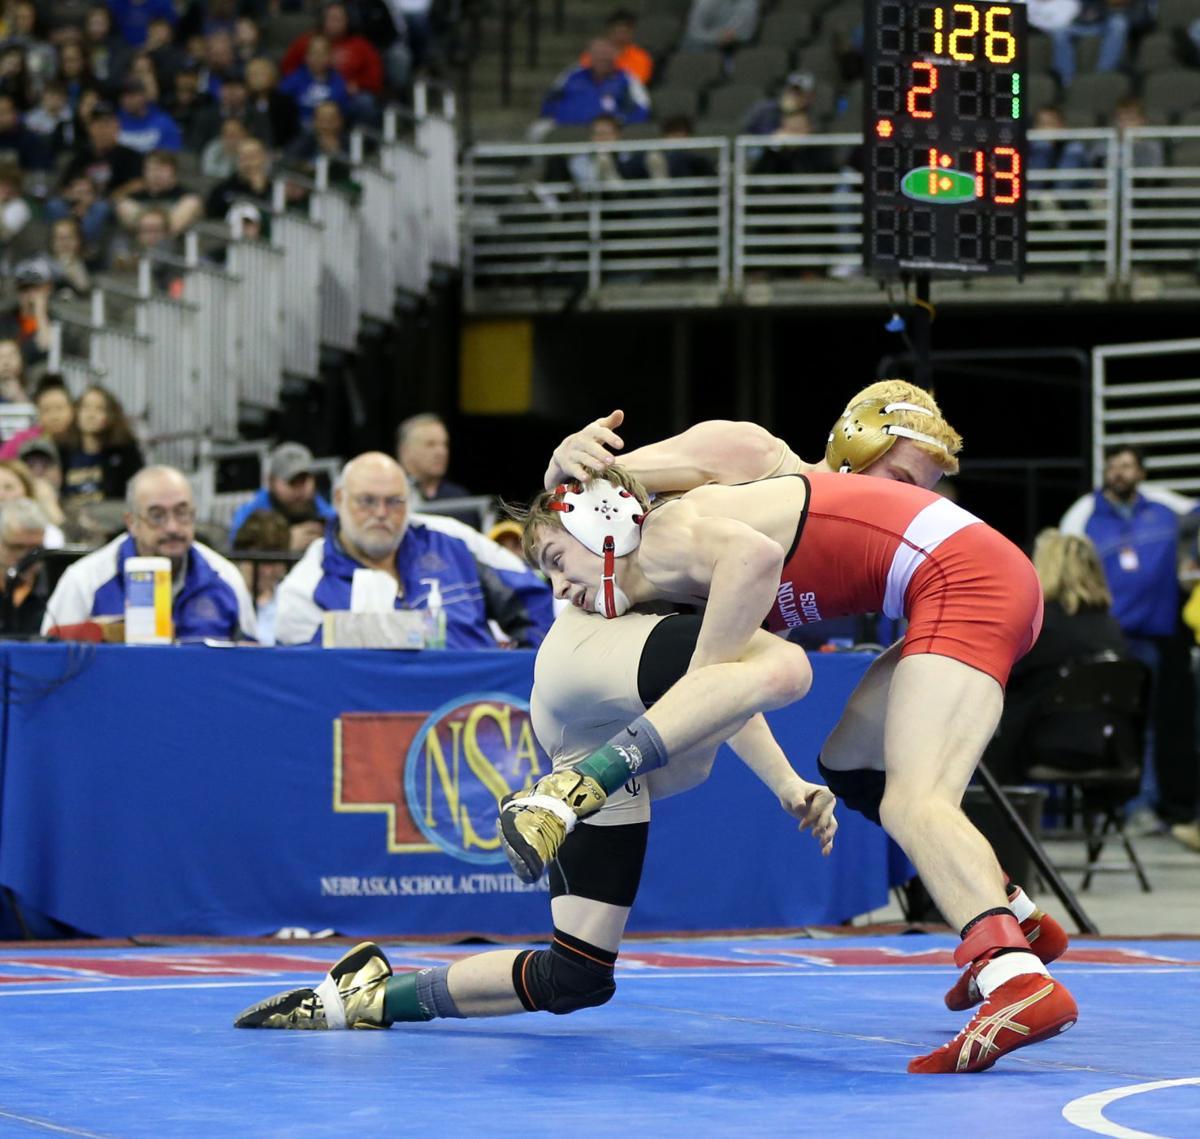 Pleasanton's Tyler Pawloski Claims Third Championship